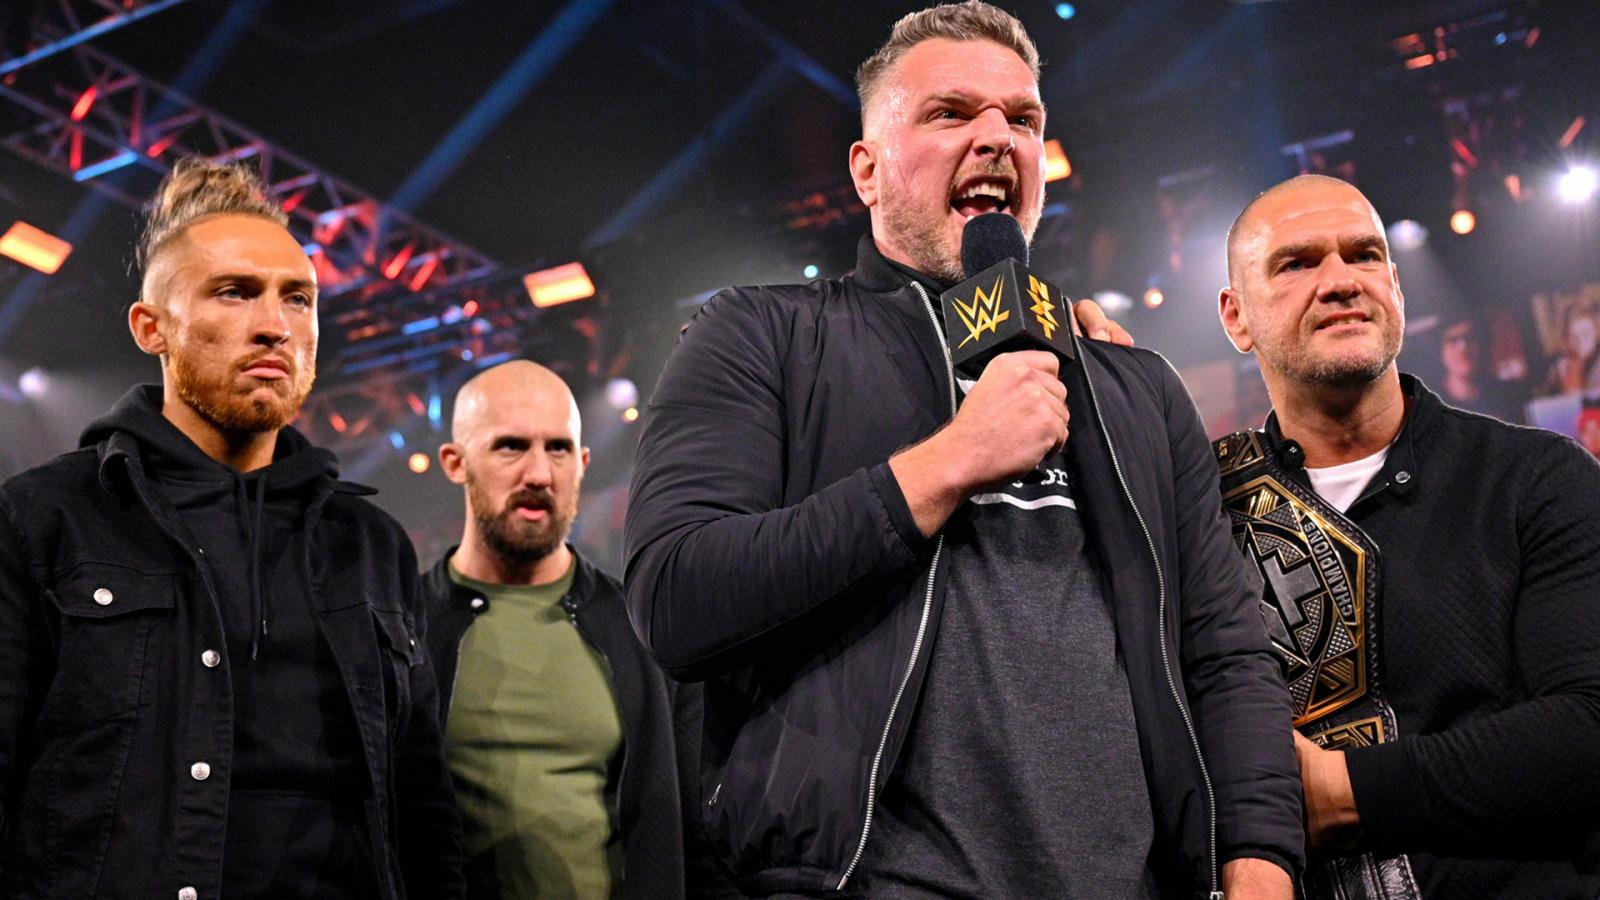 Pat McAfee NXT Status Update, Daniel Bryan on Future Career Plans, Ronda Rousey – TPWW